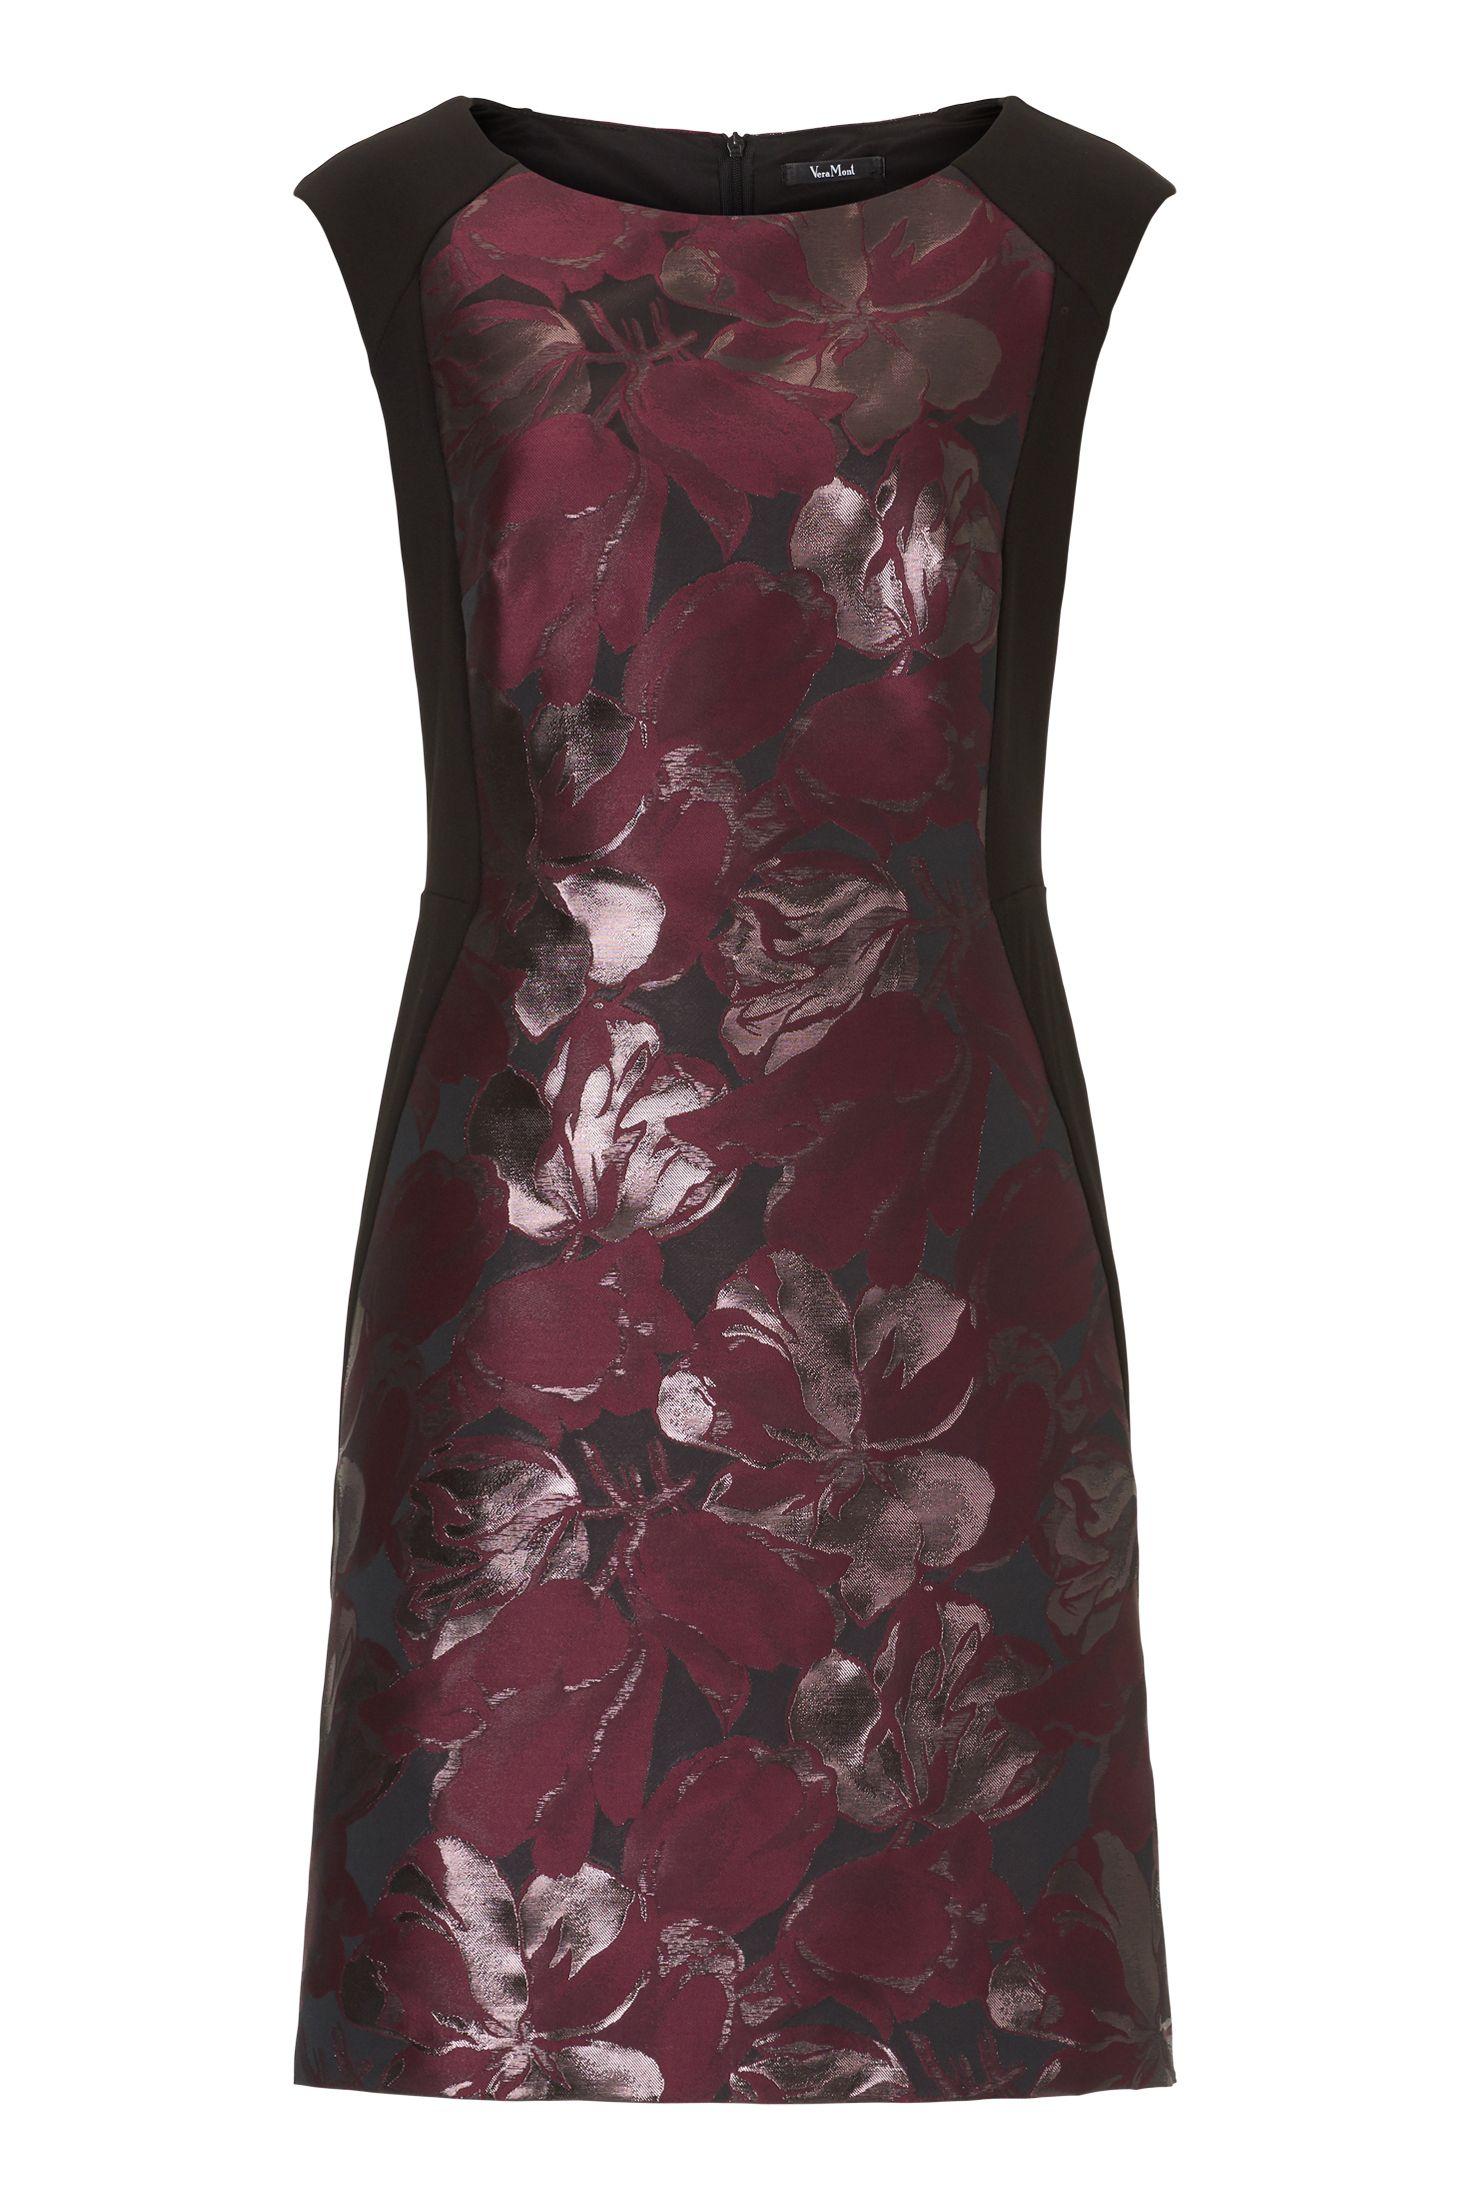 2537c22064c006 Etuikleid Blüten | Mode für Brautmütter | Etuikleid, Kleider, Mode ...